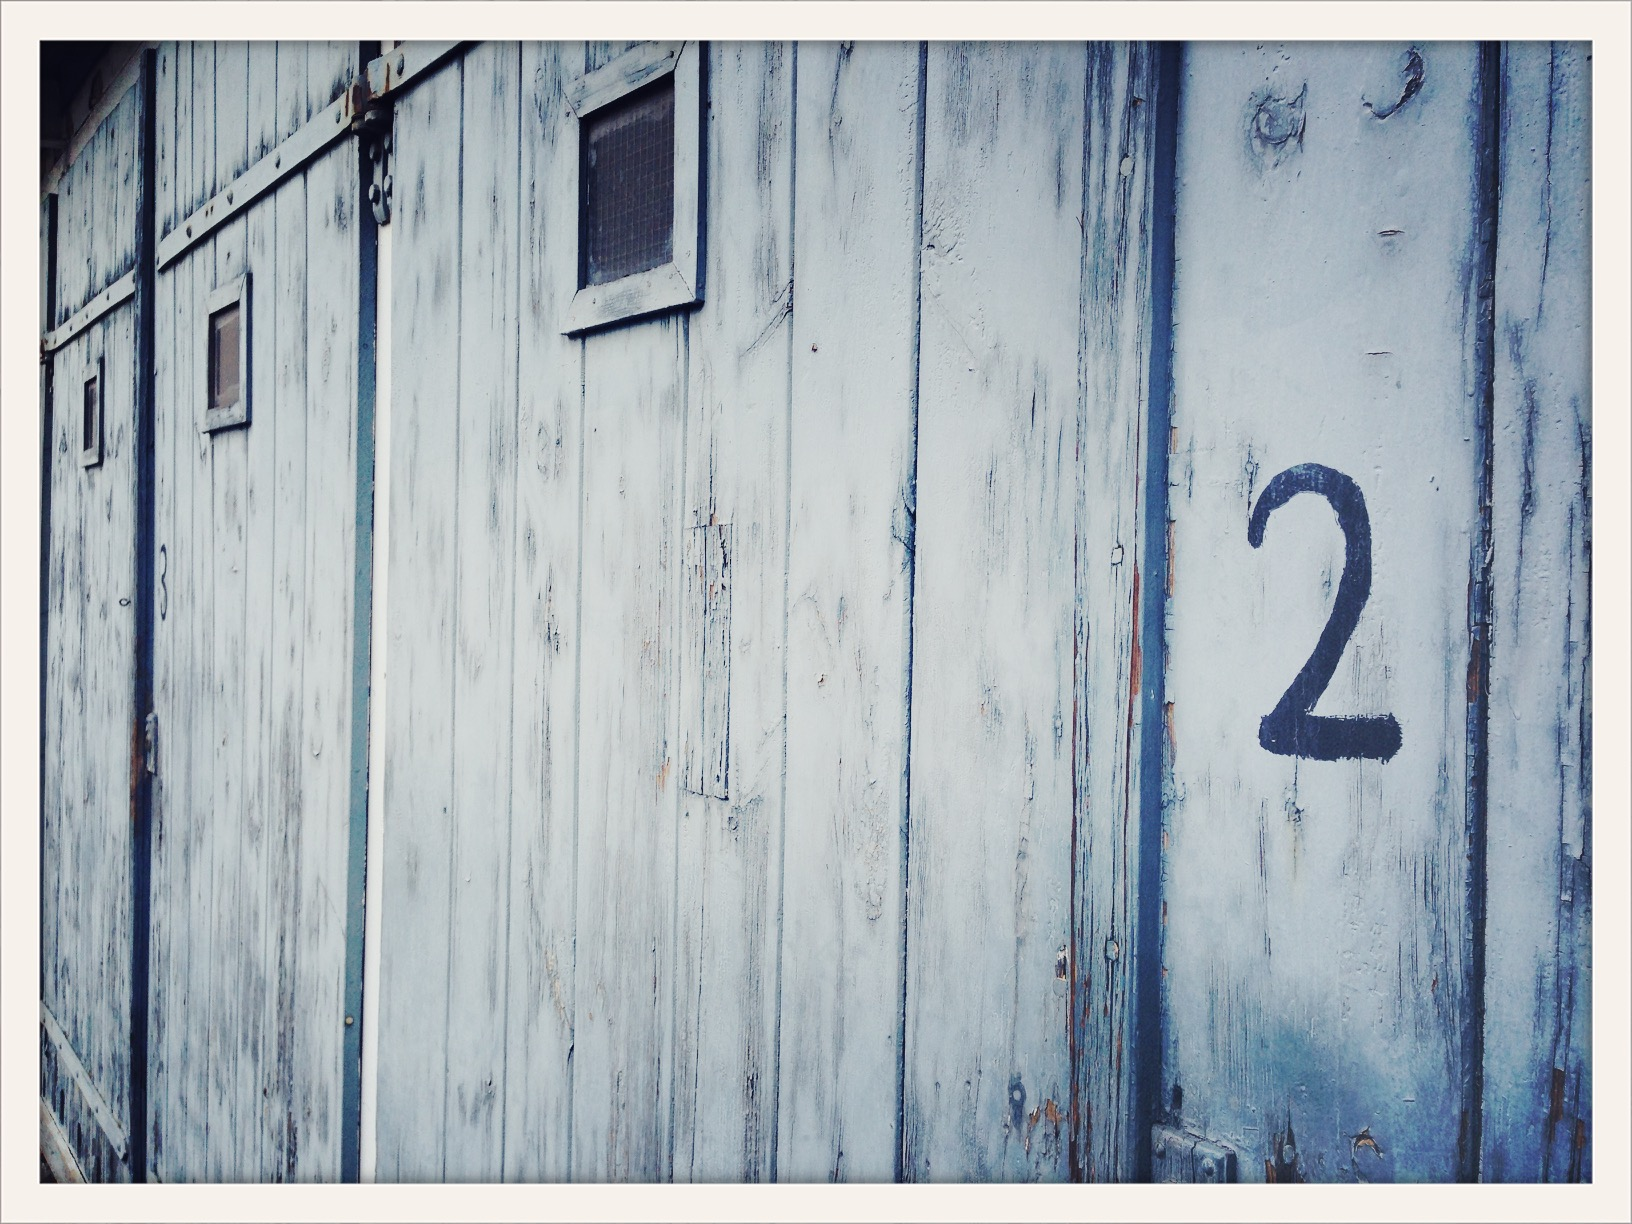 Garages Muskauerstrasse Kreuzberg Berlin ©lowereast